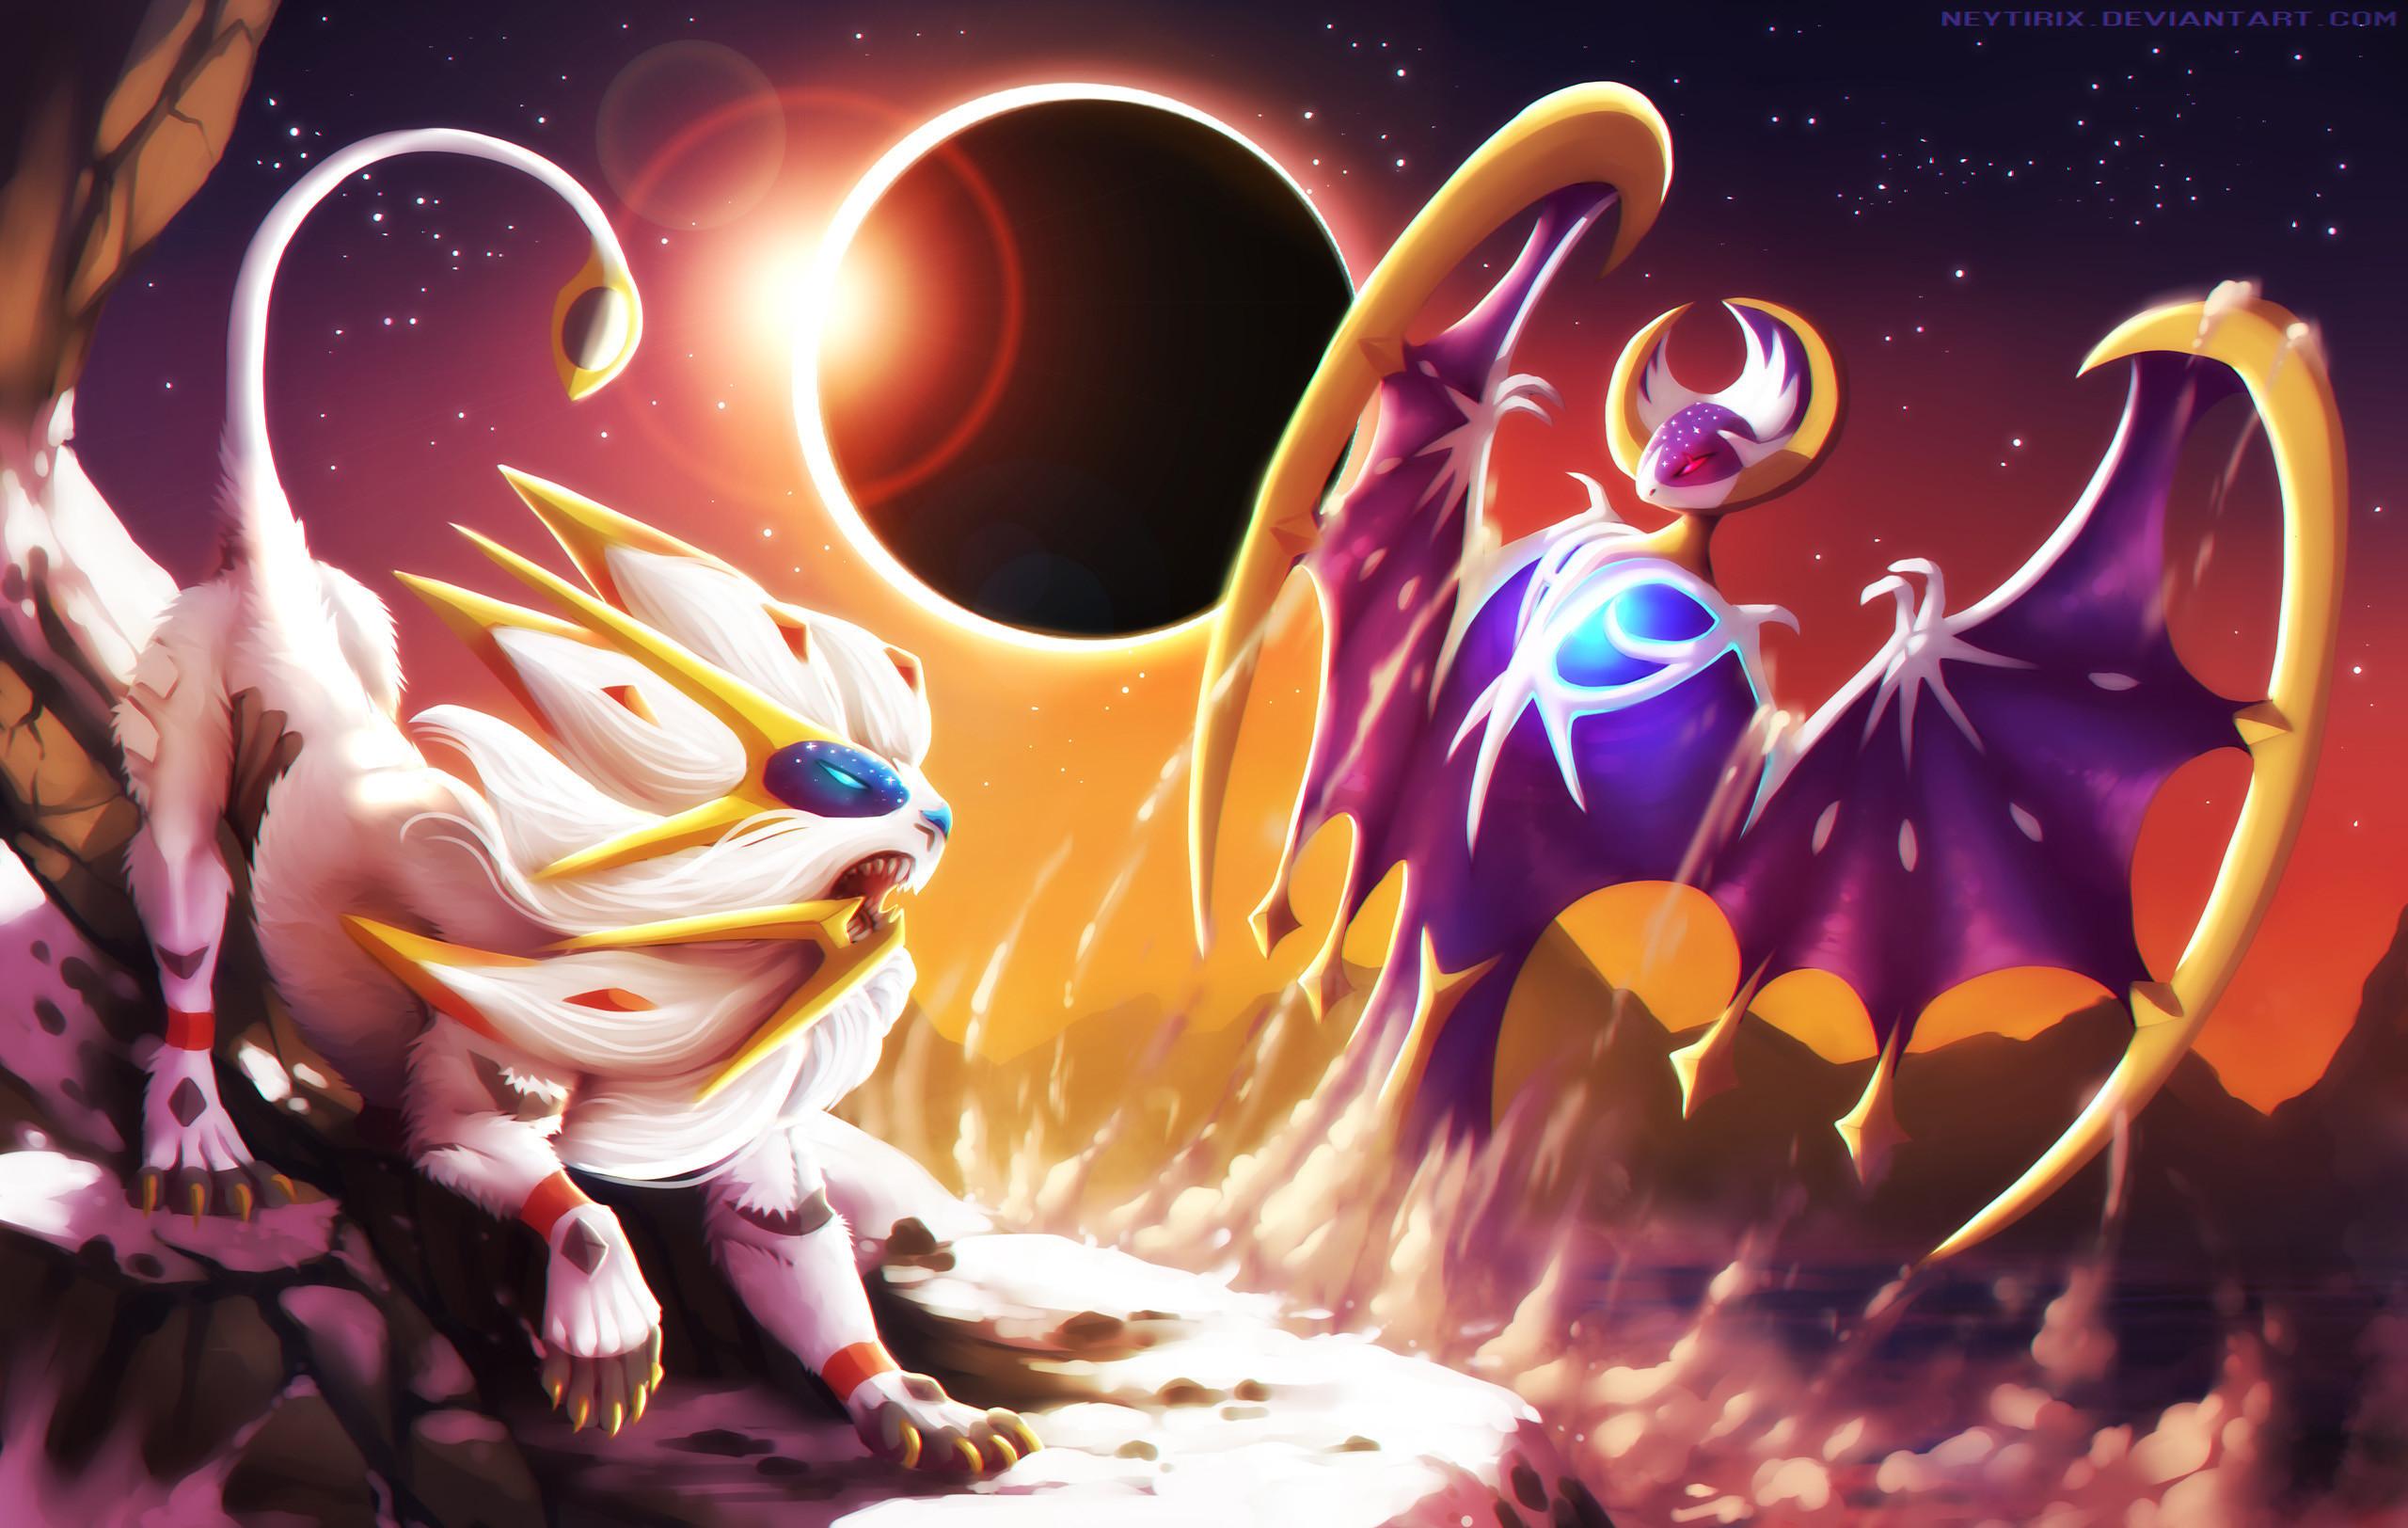 2560x1624 Hd Wallpaper Legendary Pokemon Wallpaper Hd 2560x1624 Wallpaper Teahub Io